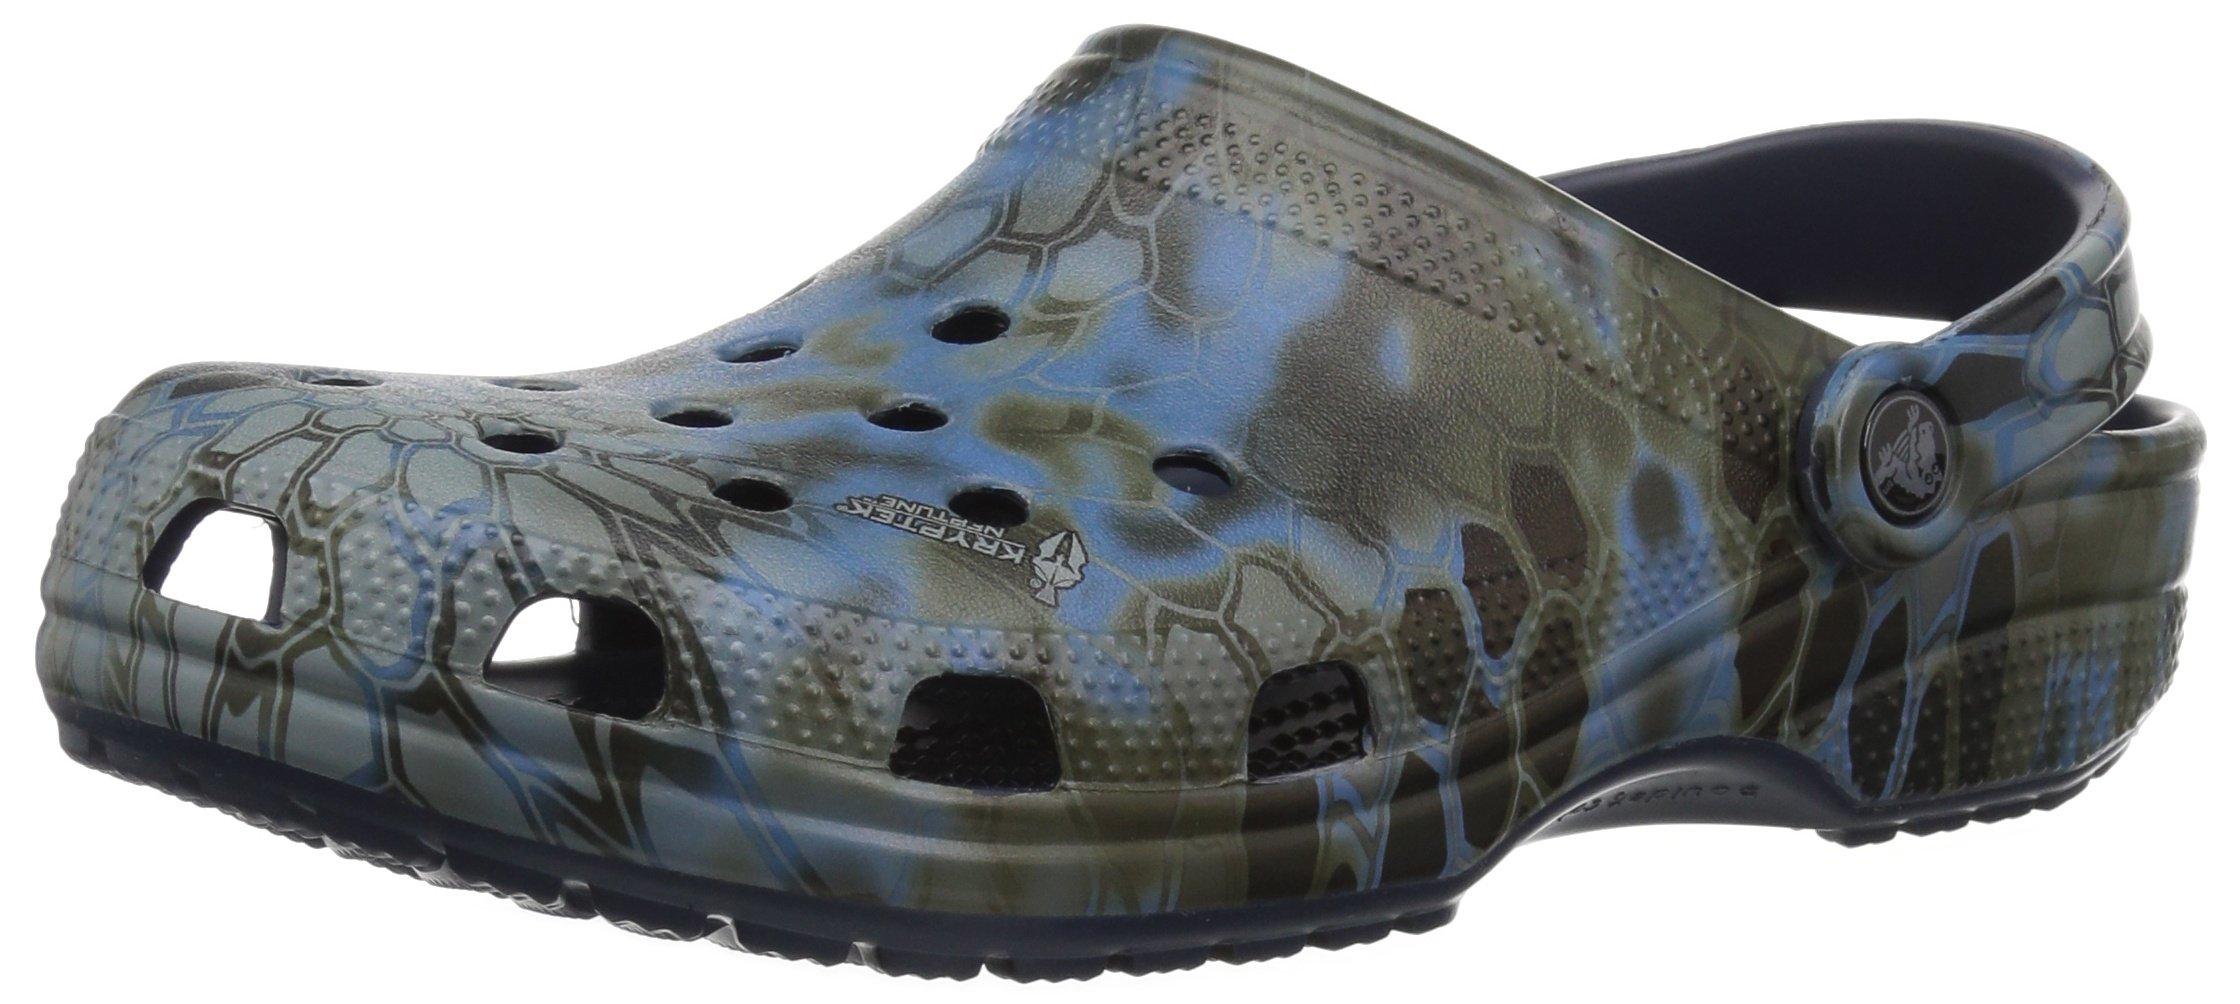 Crocs Classic Kryptek Neptune Clog Shoe, Navy, M5W7 M US